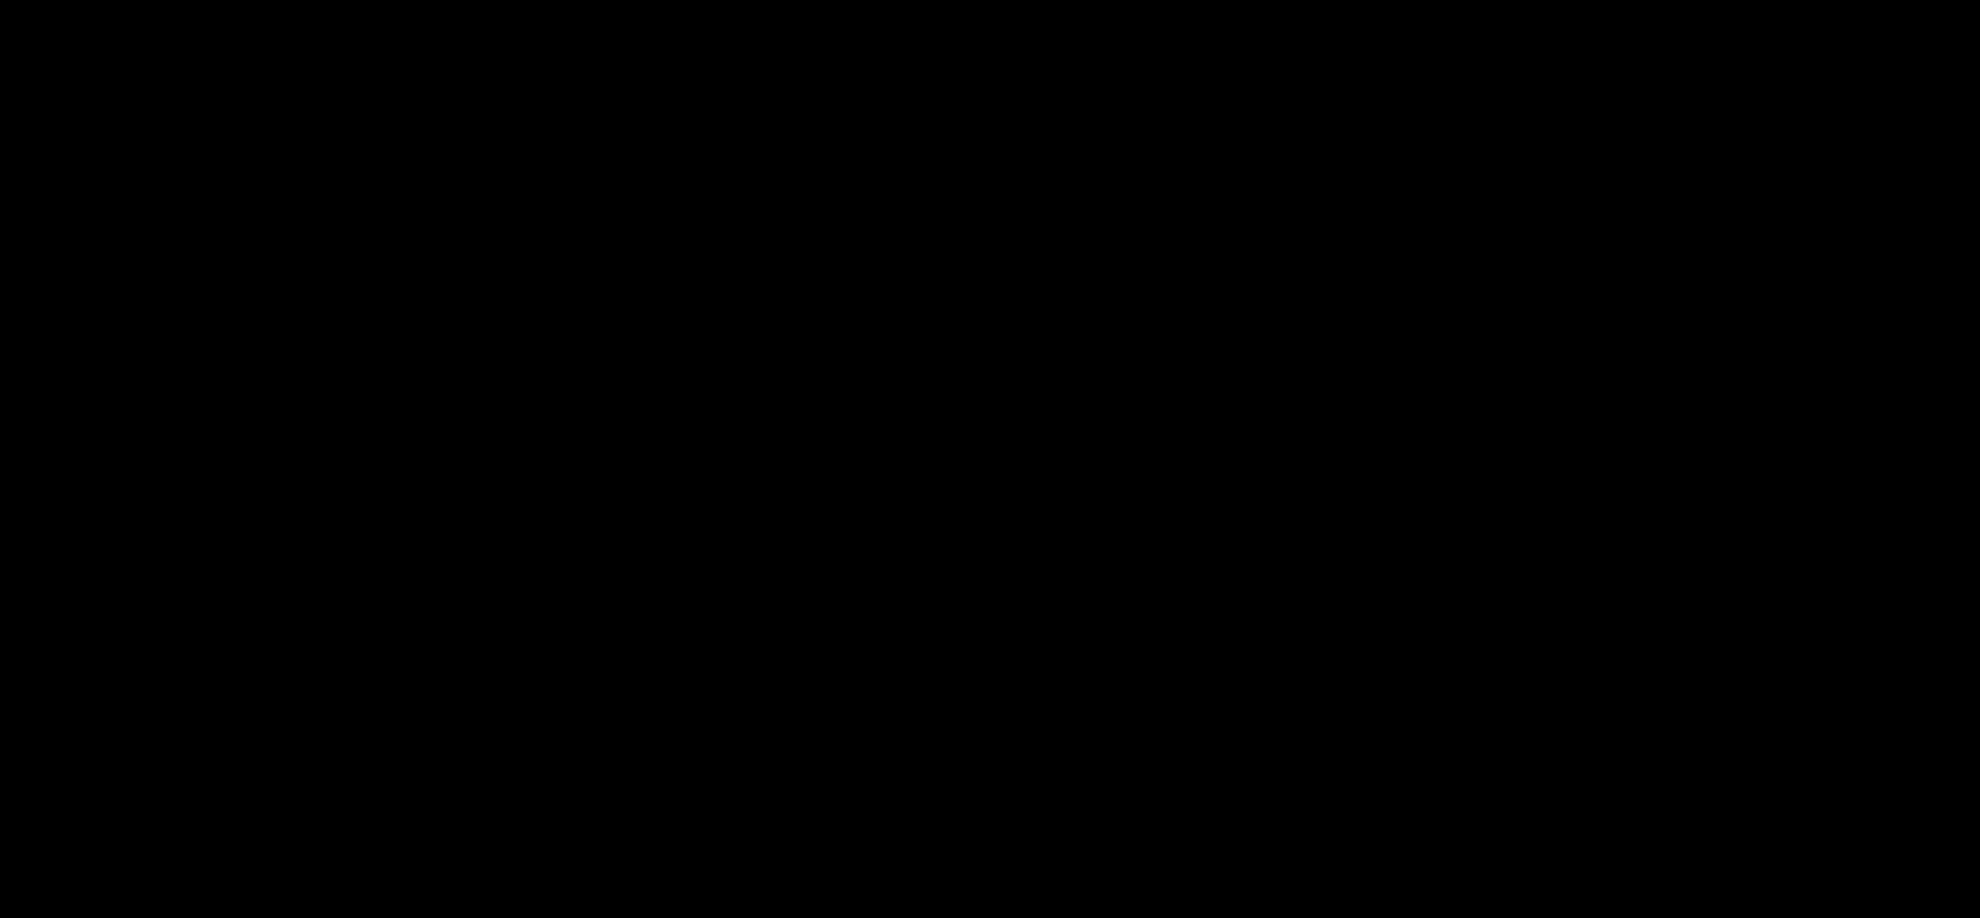 Logotipo - Rutas de Senderismo de Quiroga